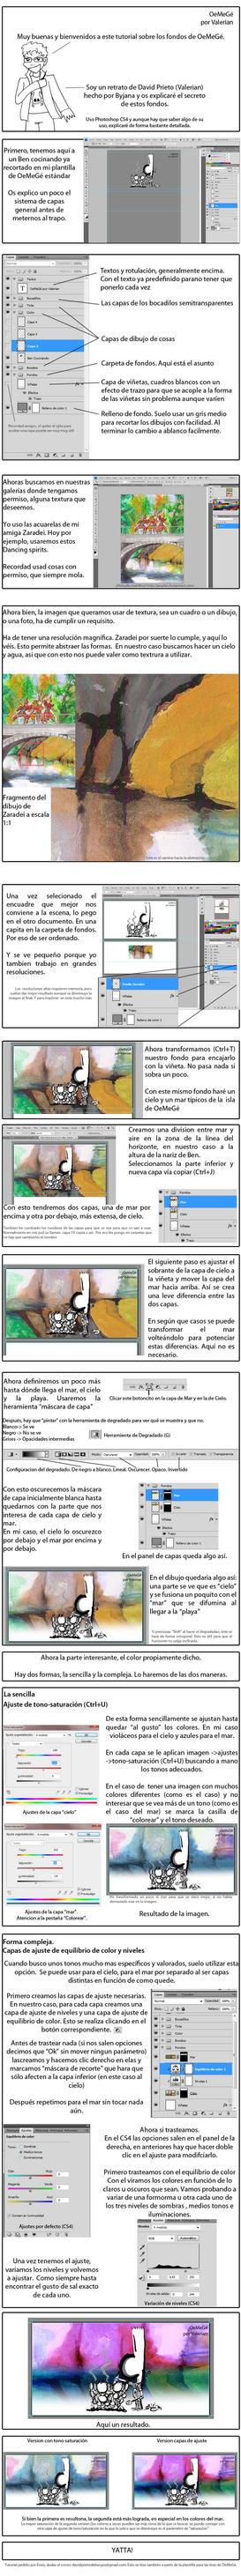 Tutorial Fondos OeMeGisticos by Valerian32